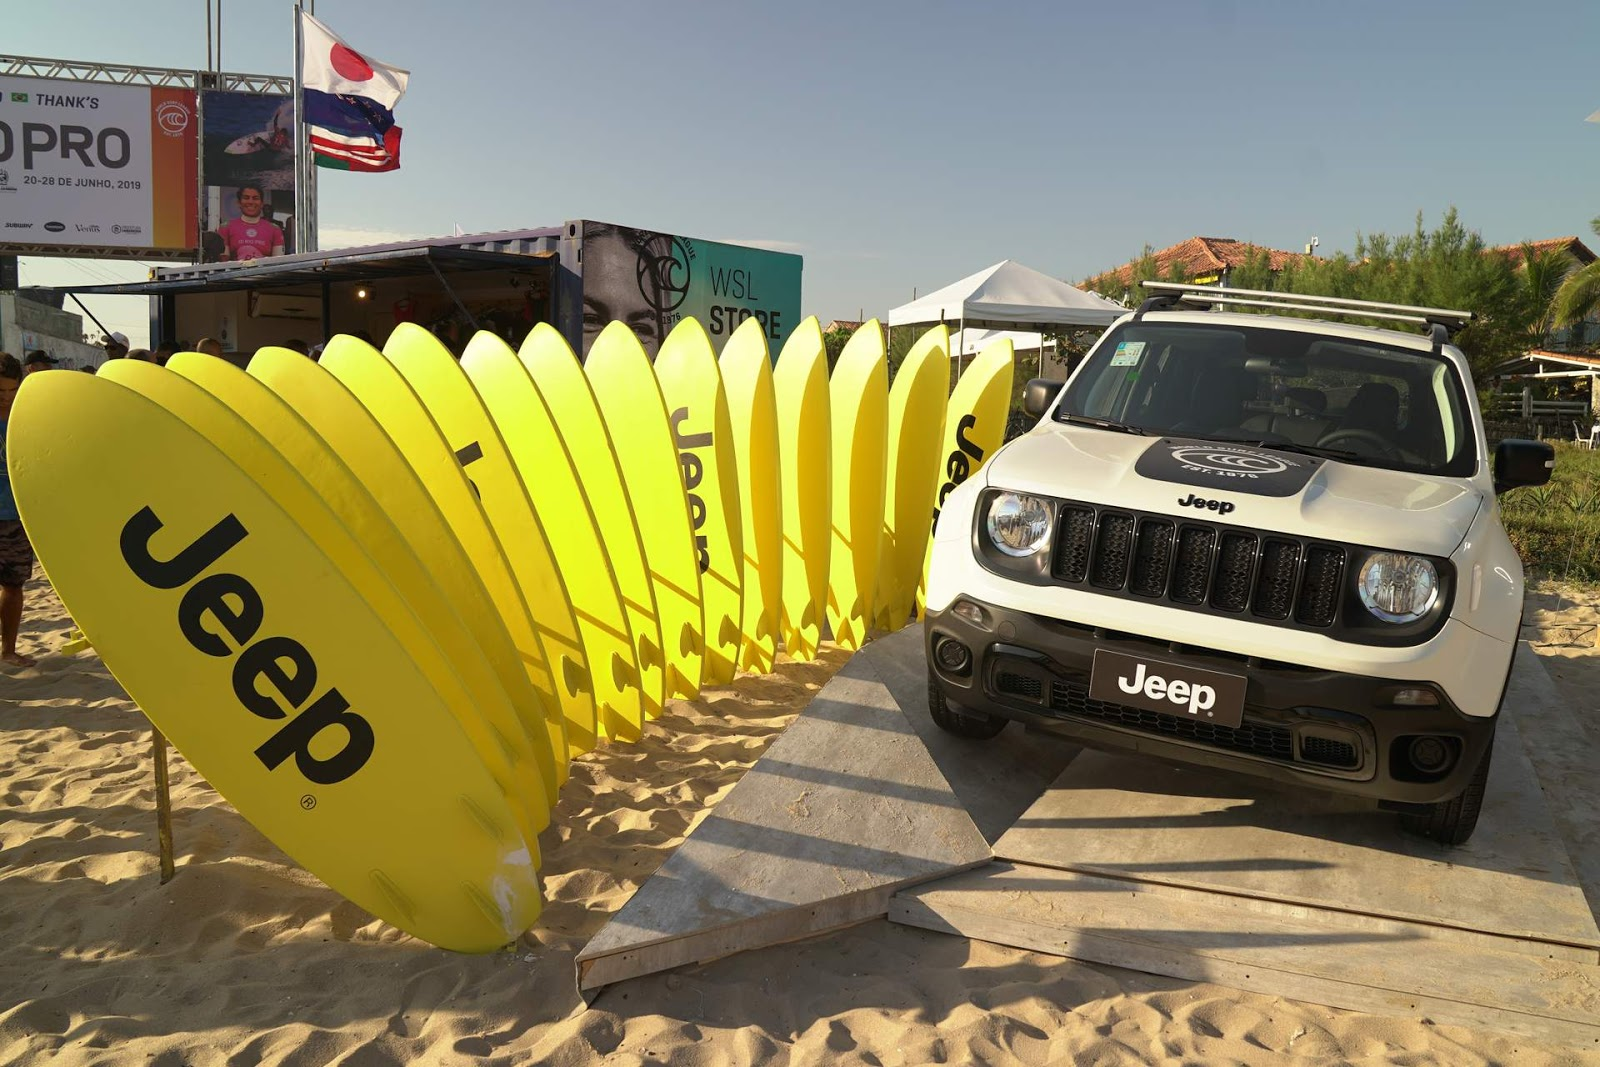 Jeep Renegade Wsk 2020 Serie Limitada Preco R 99 590 Car Blog Br